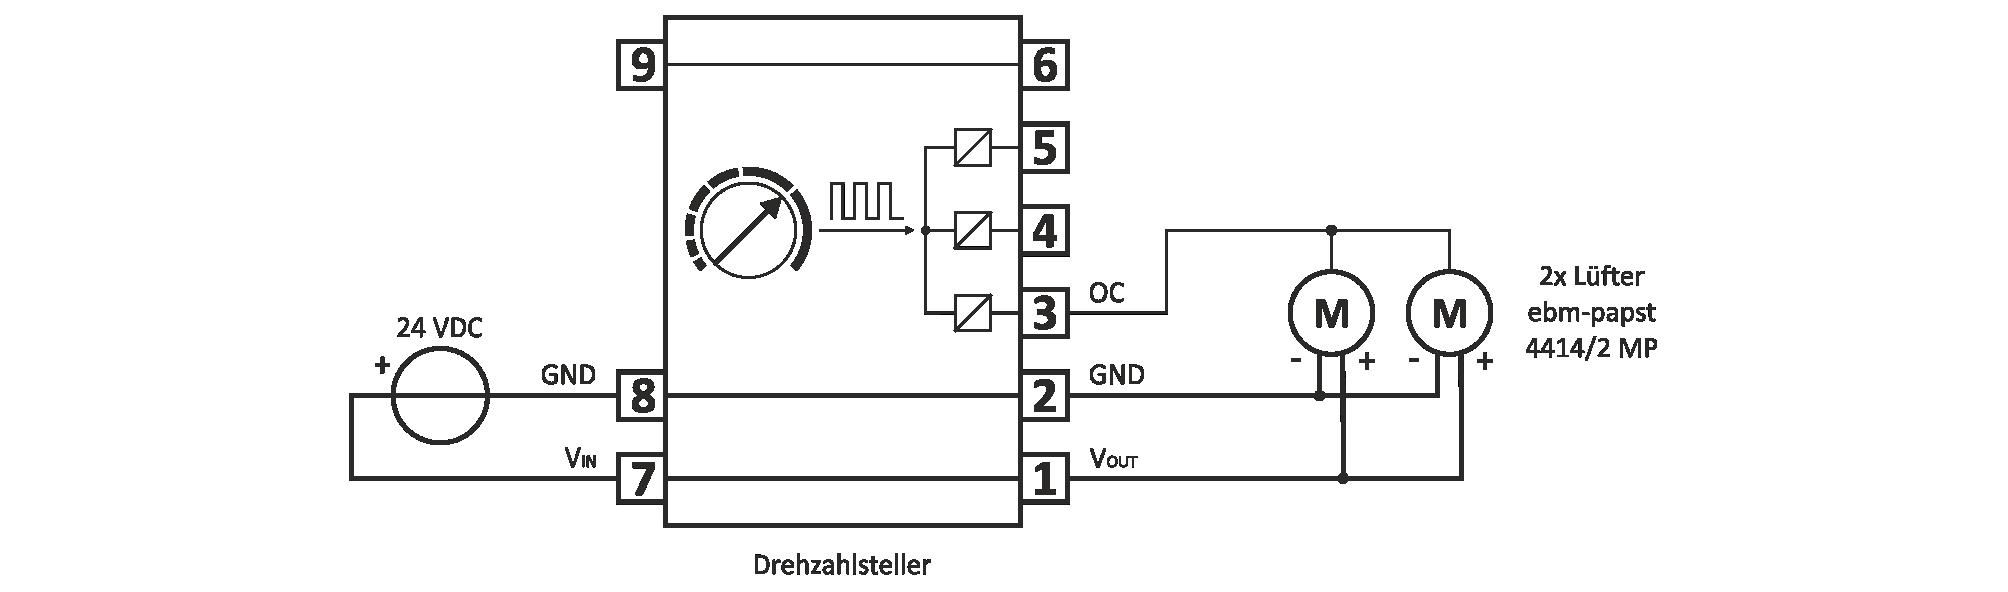 Drehzahlsteller - PWM, AC- & DC-Motoren